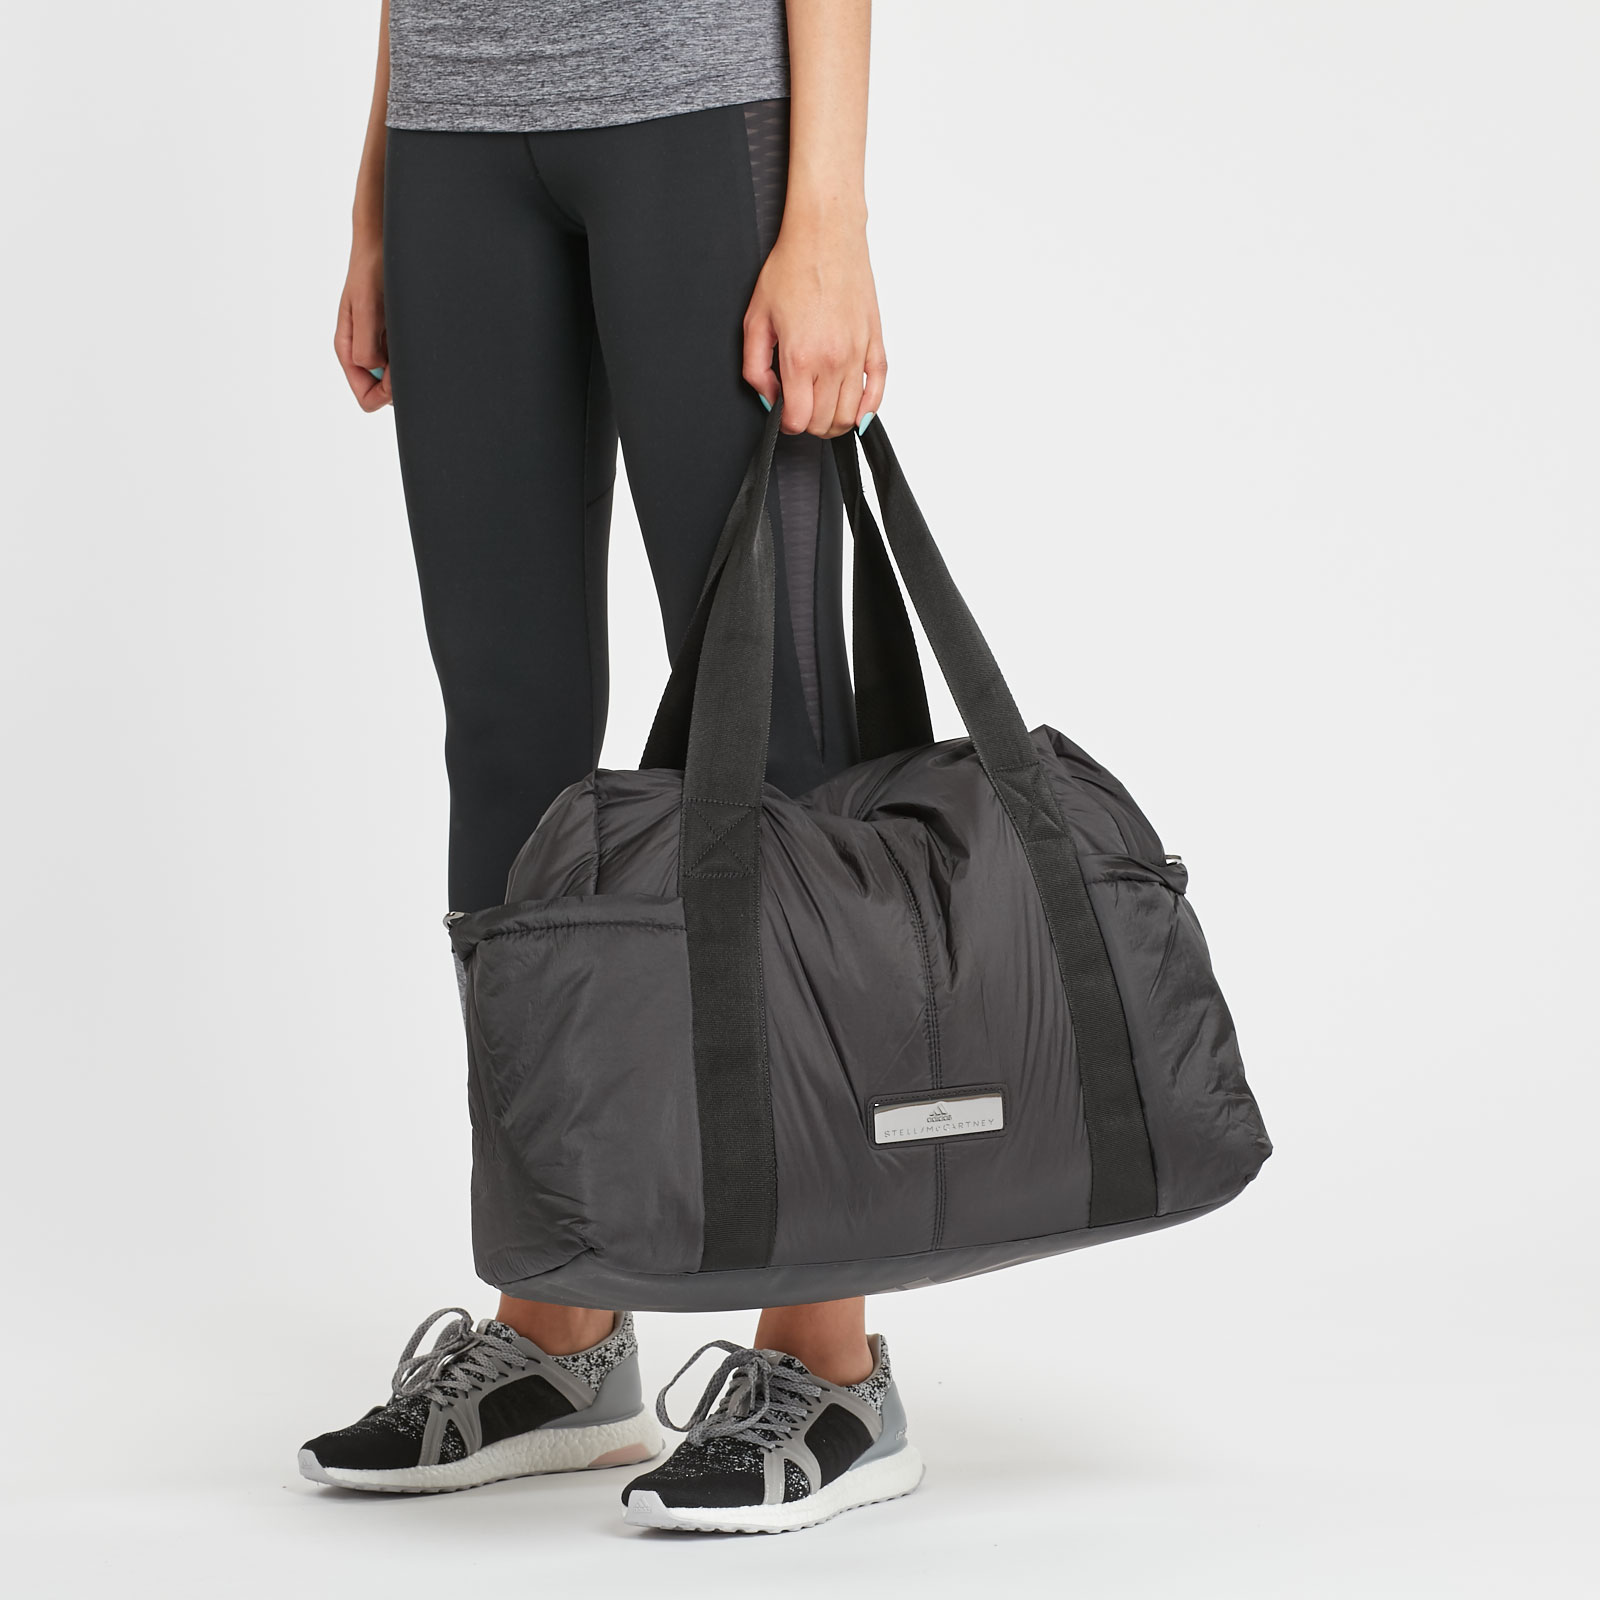 7dab82a7d1cd Stella Mccartney Shipshape Gym Bag